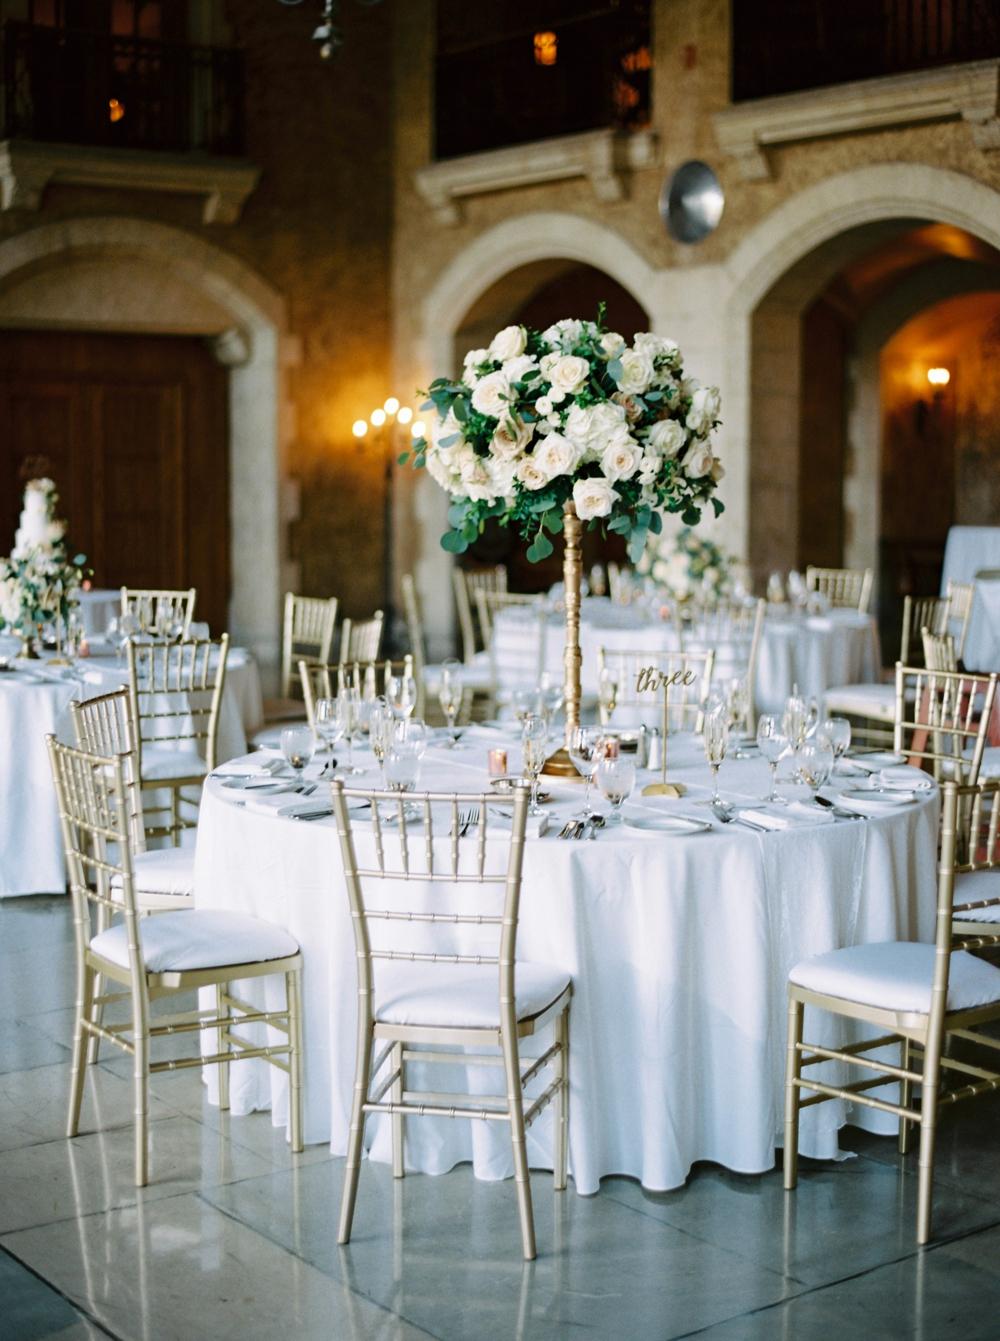 Mt Stephen Hall Reception at Fairmont Banff Springs Hotel | Banff Rocky Mountain Wedding Photographers | Justine Milton fine art film photography